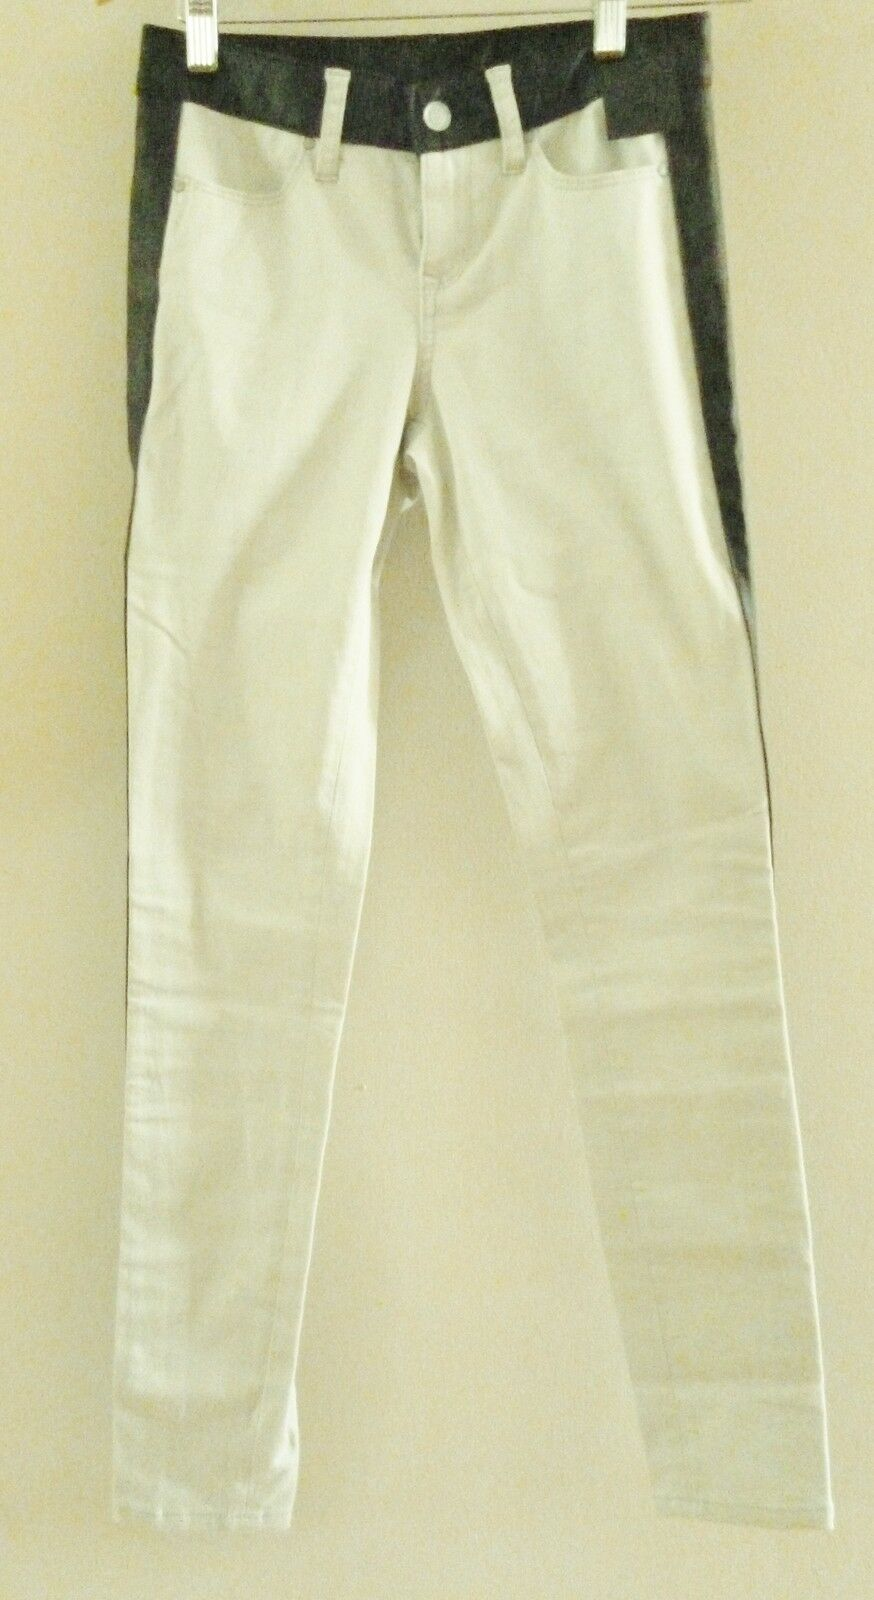 New Club Monaco Lillian Pants Isle White with PU  Leather Trims Size 0